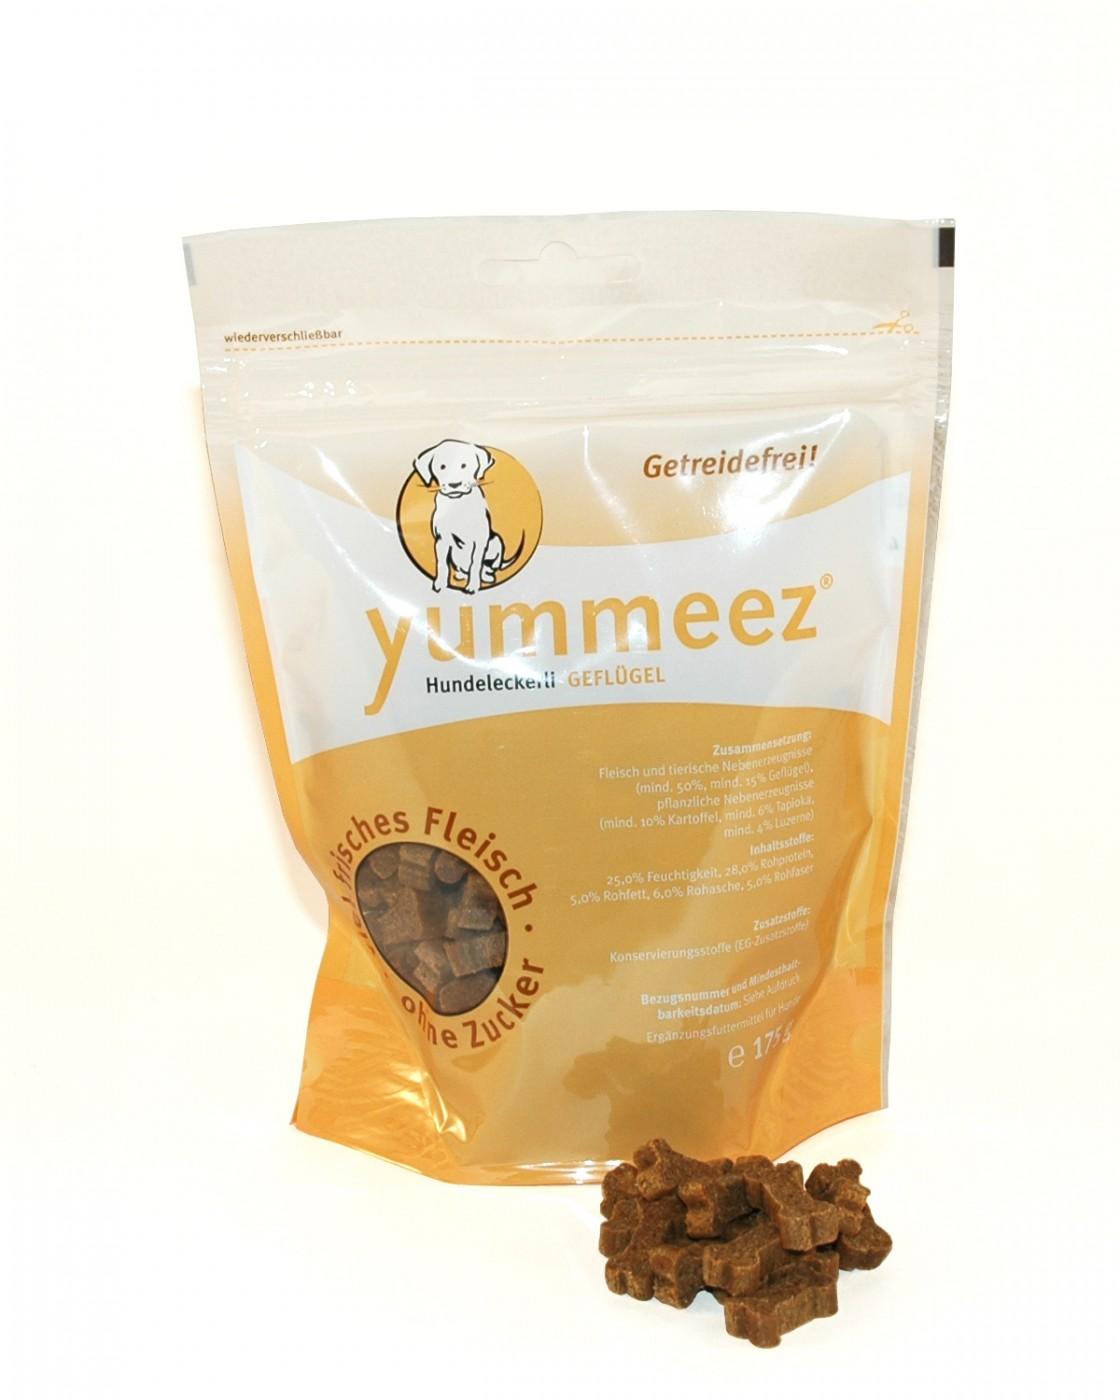 Yummeez Geflügel | 175g getreidefreier Hundesnack